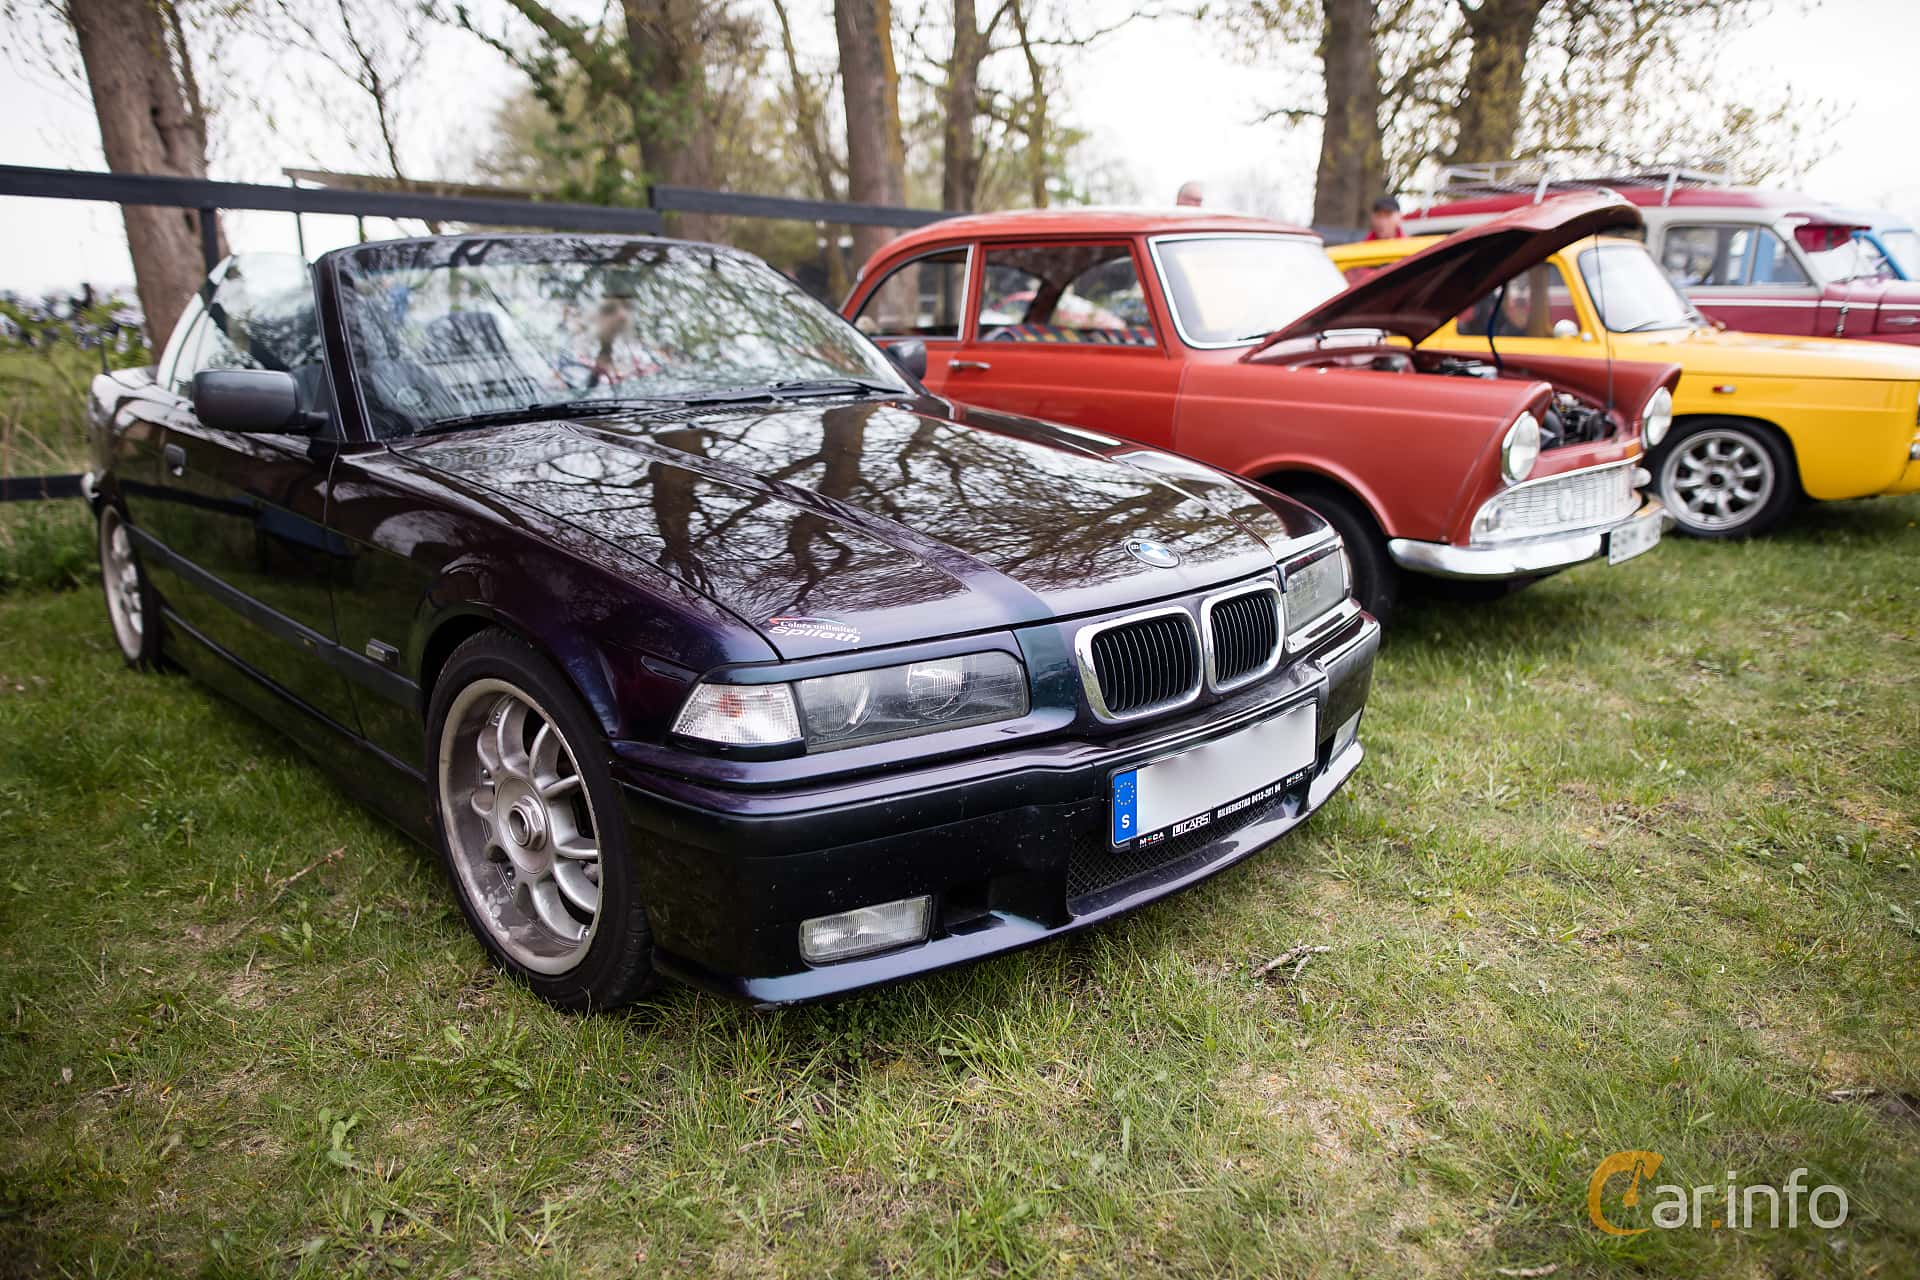 Bmw 318i Convertible 115hp 1995 Generation E36 Facelift